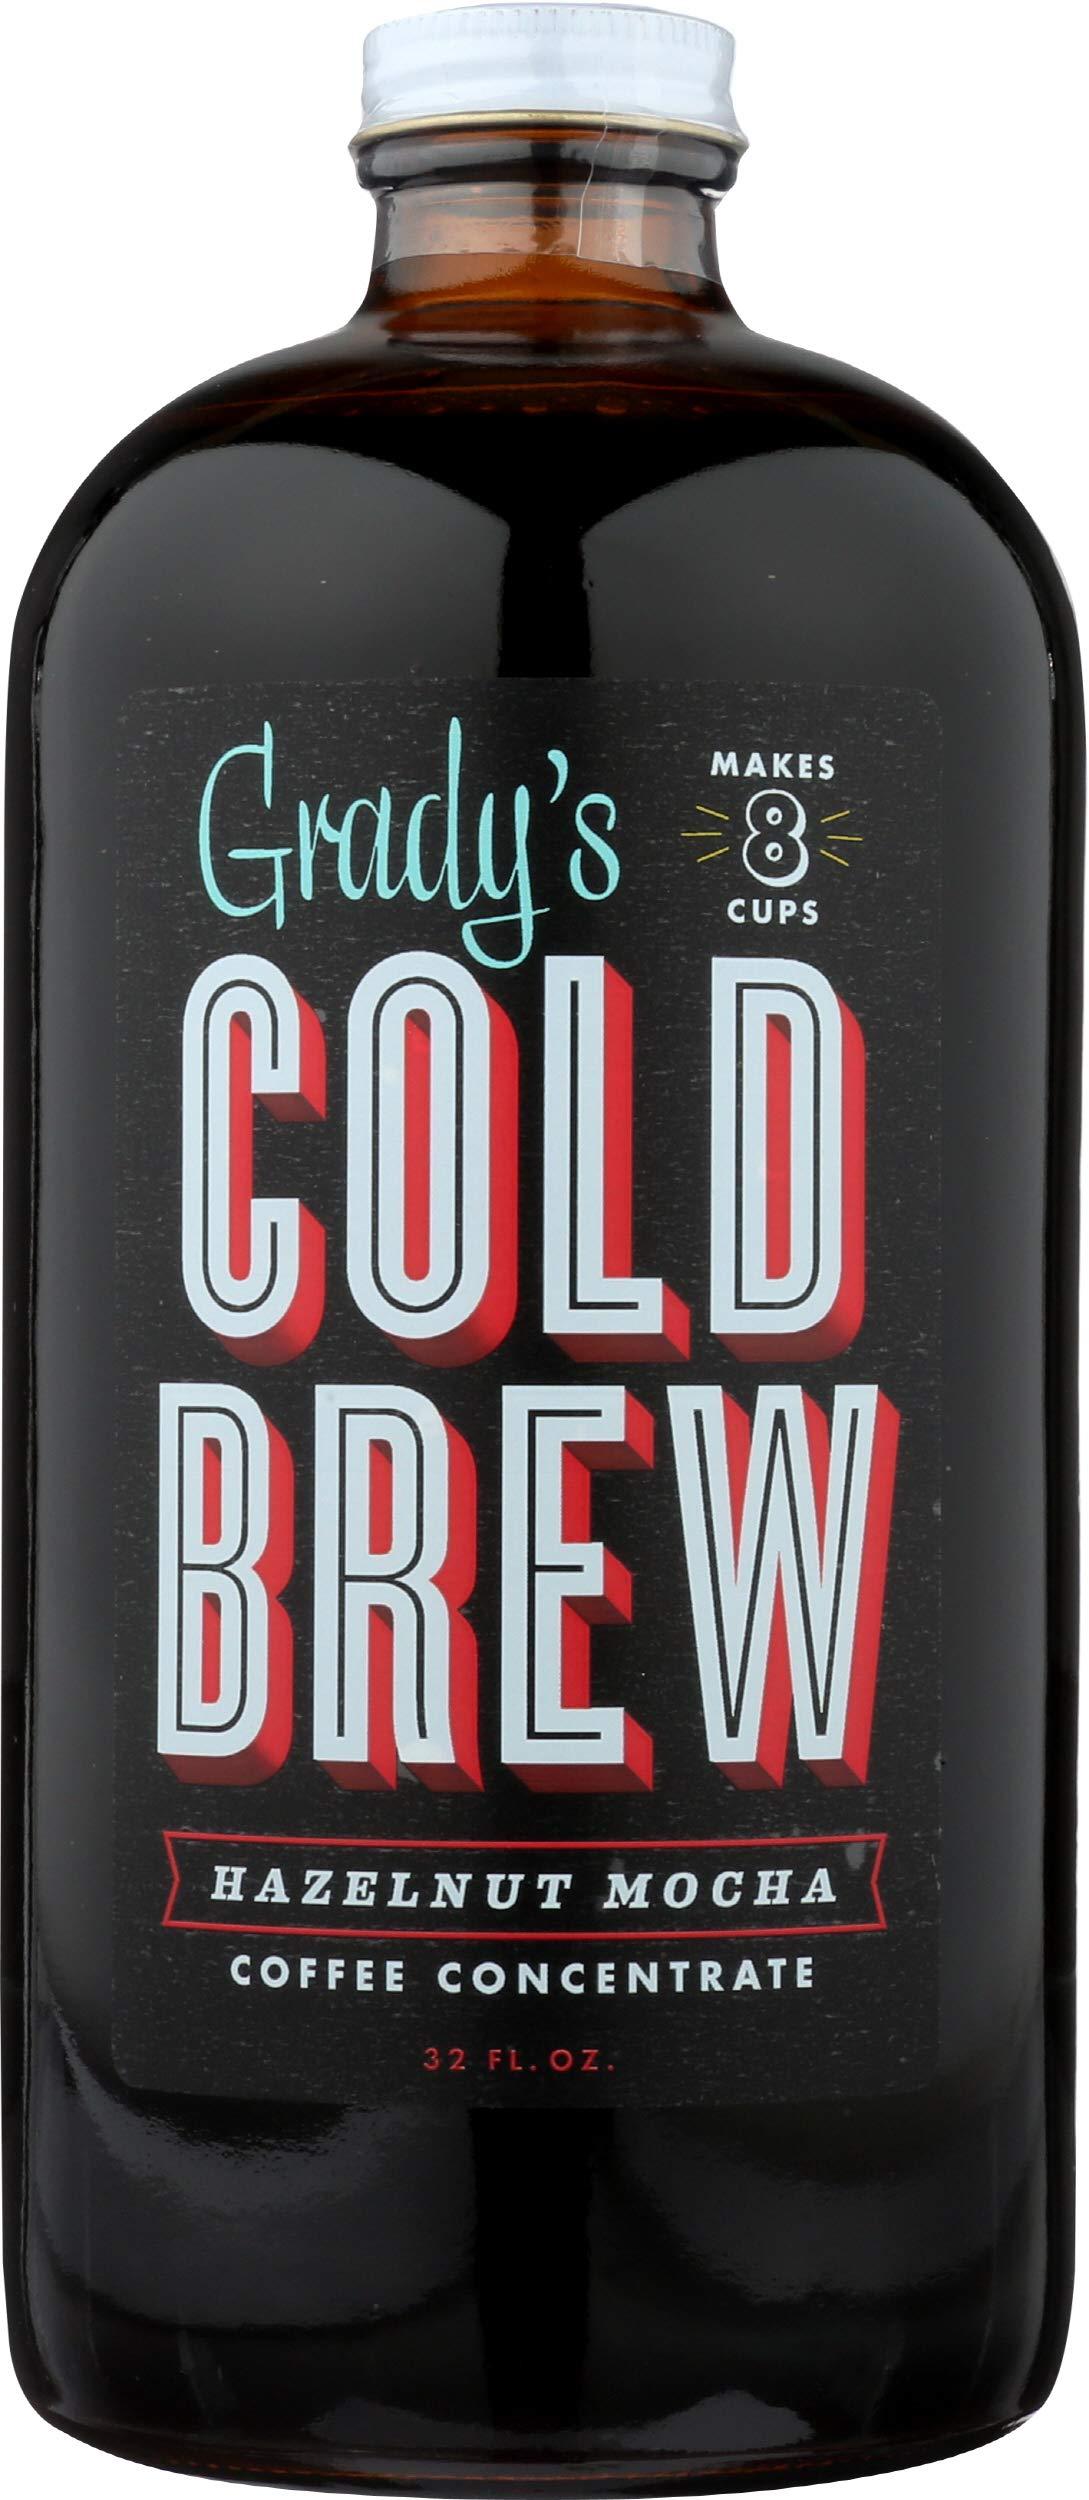 Grady's Cold Brew Grady's Cold Brew Hazelnut Mocha Coffee Concentrate Makes 8 Cupsper Bottle,, 32 Fl Oz (pack Of 6)